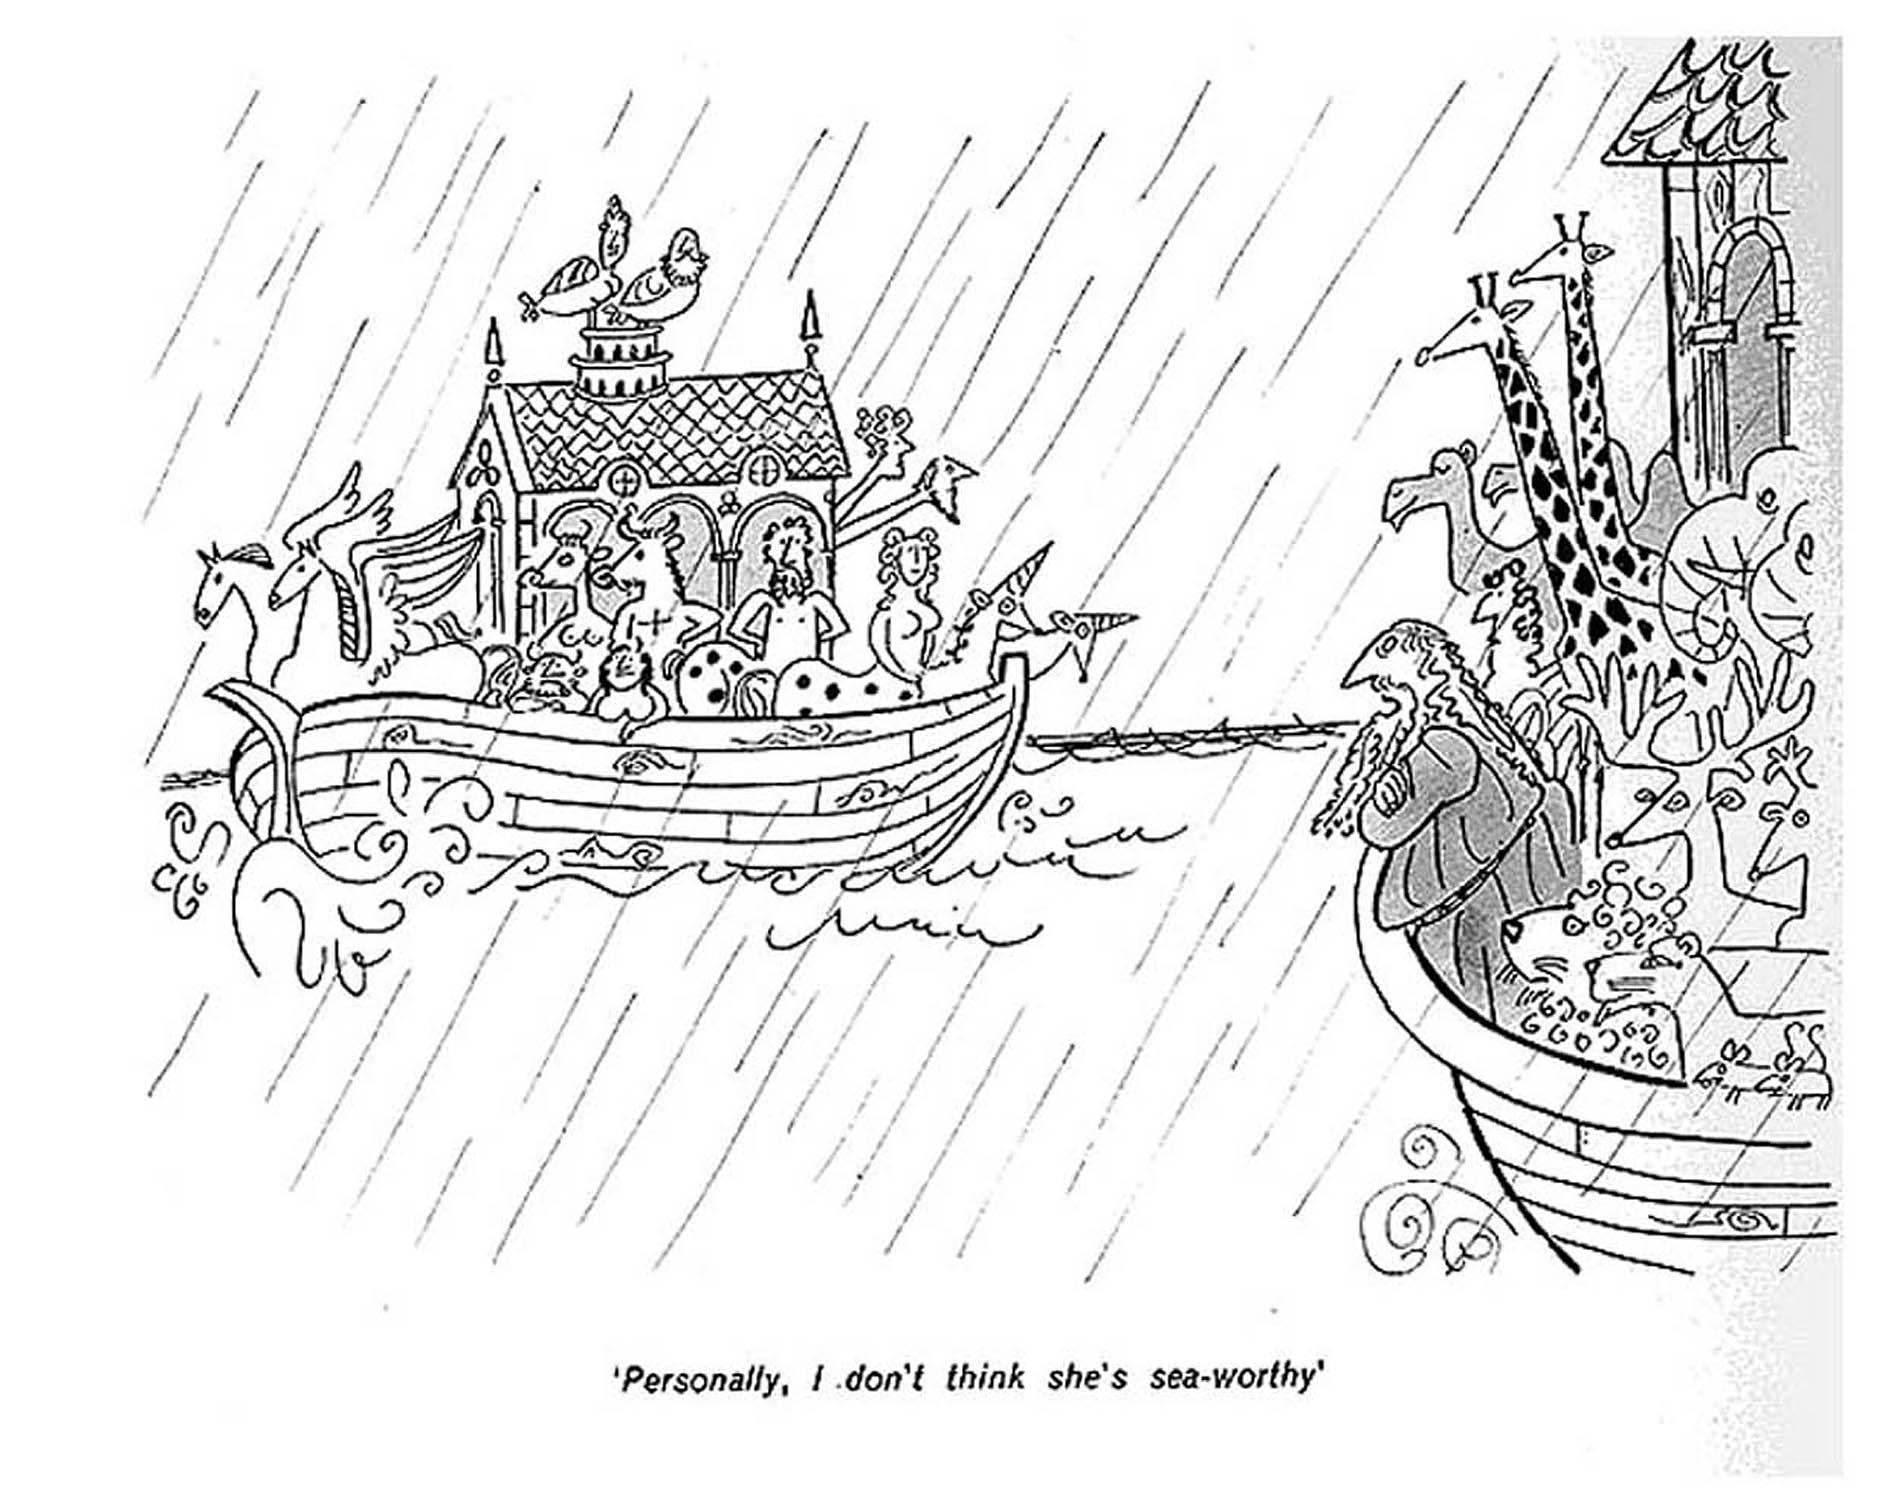 Noah Ark Drawing at GetDrawings.com   Free for personal use Noah Ark ...